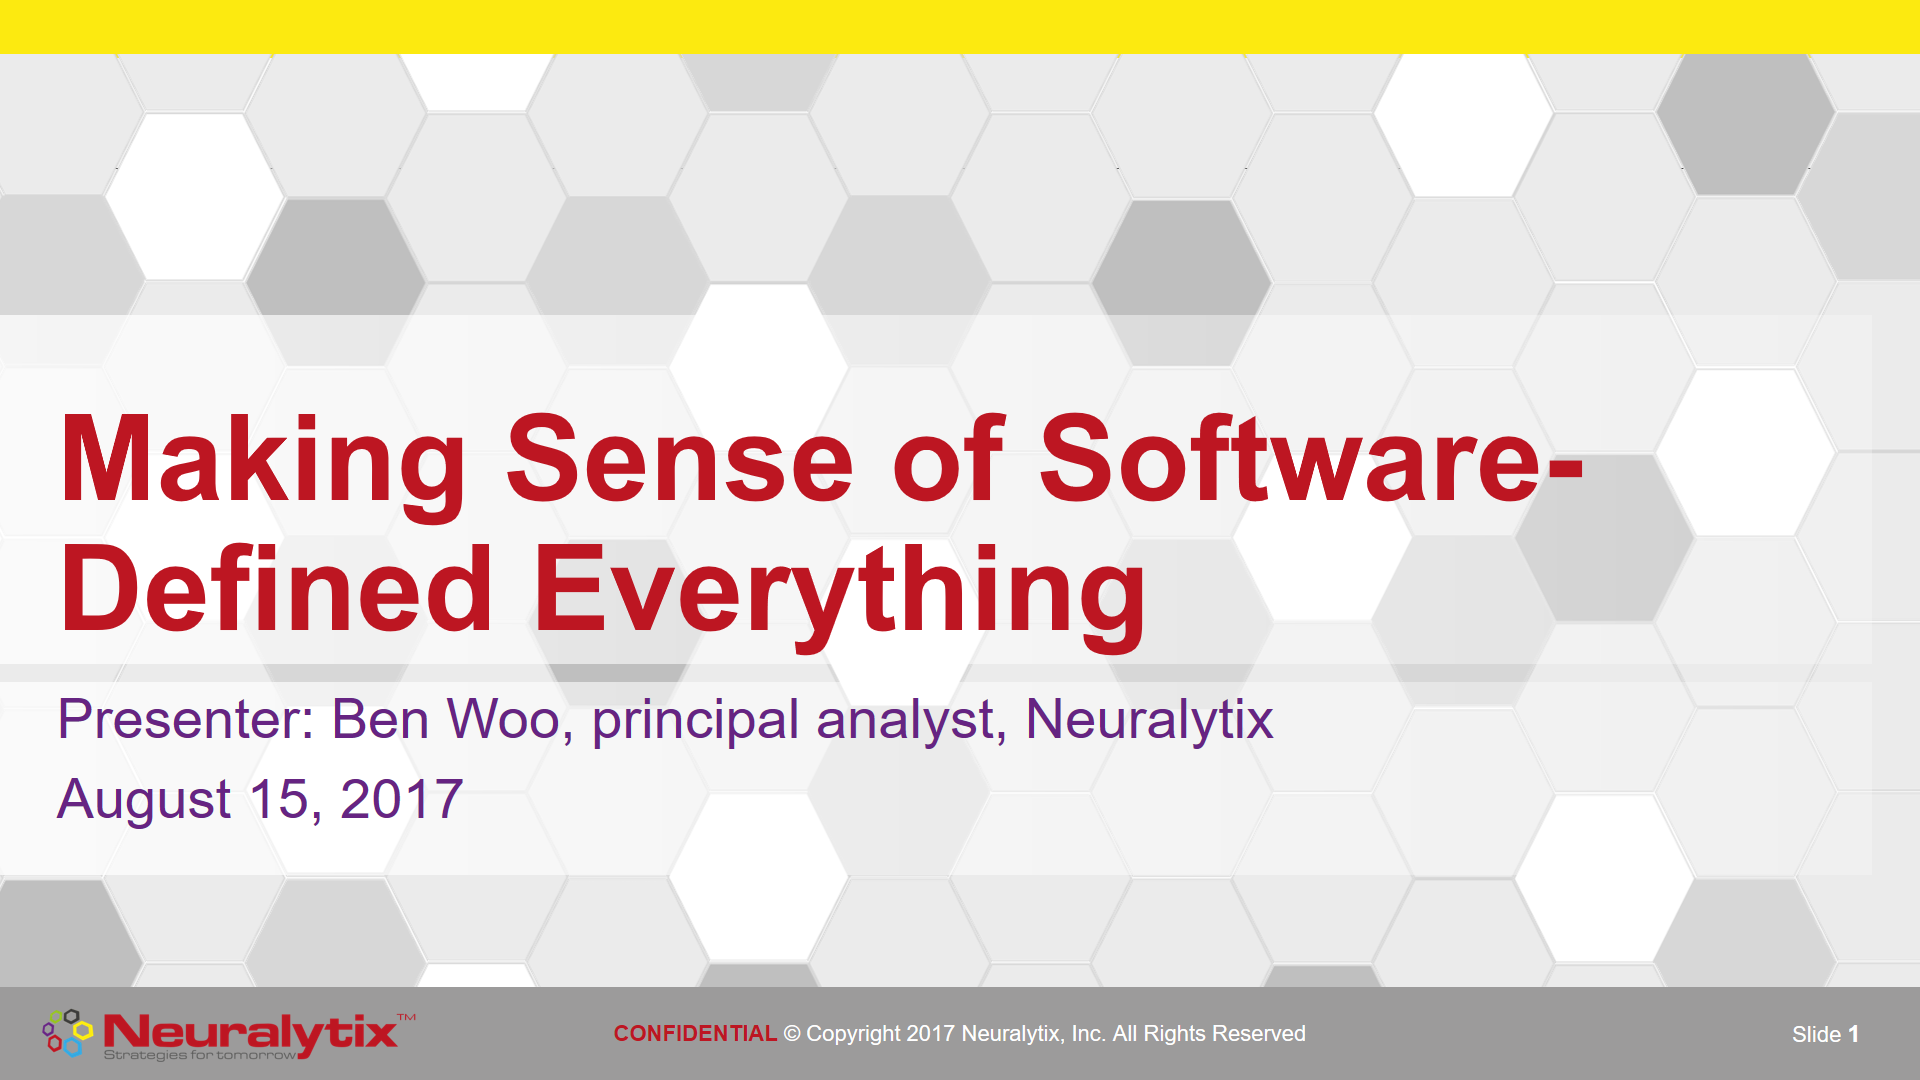 Making Sense of Software-Defined Everything [Webinar]